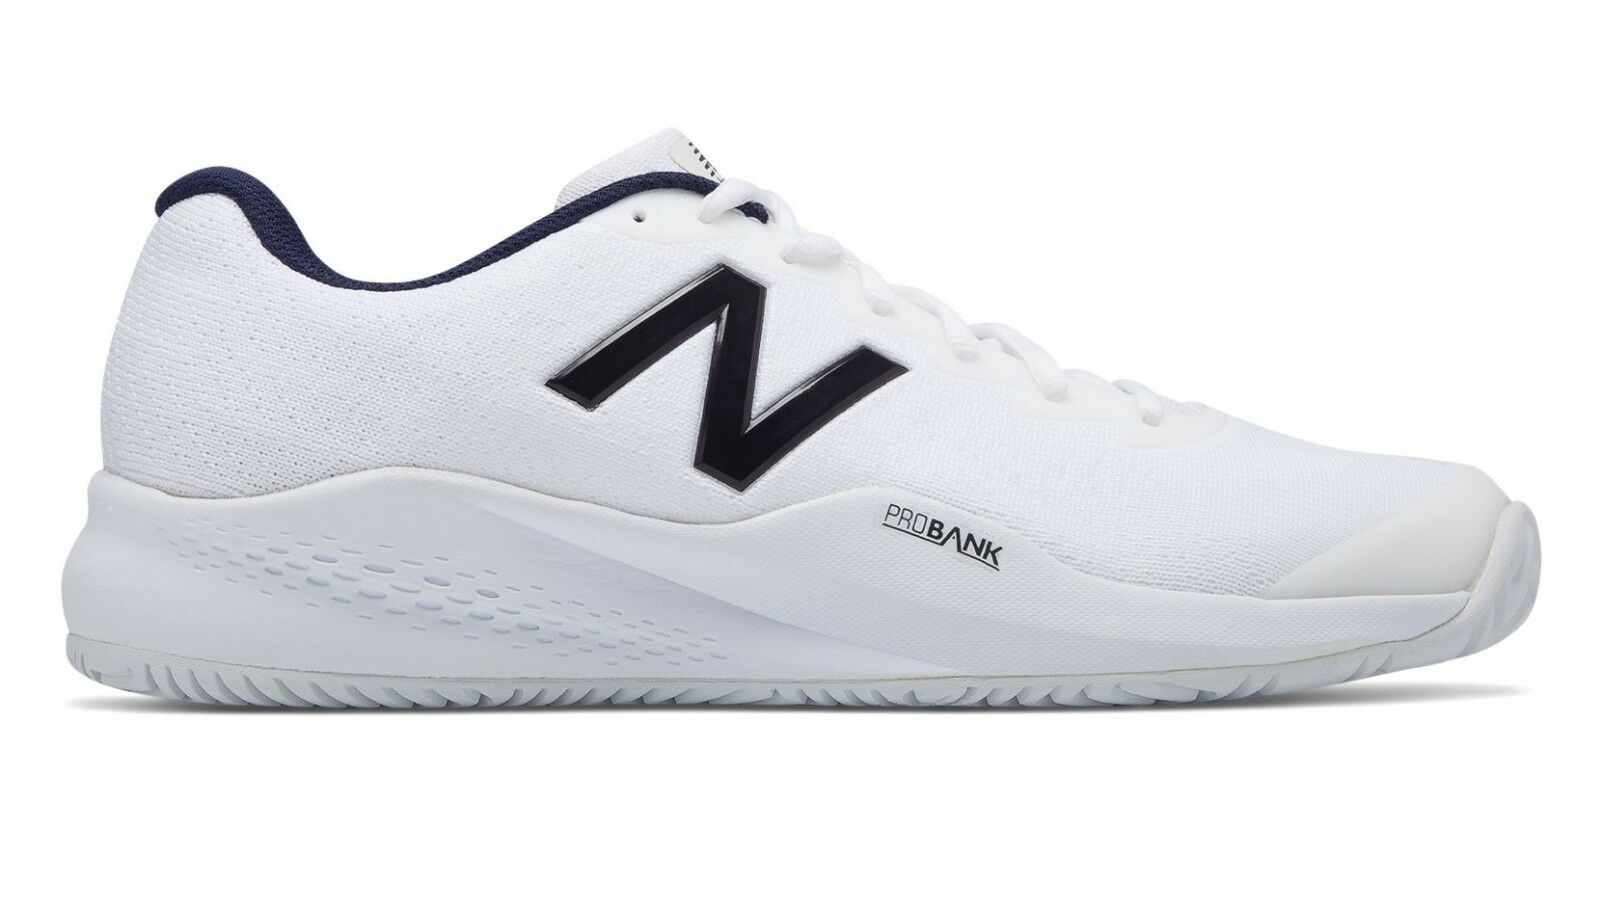 New Balance NB MCH996P3 Uomo 996v3 bianca Performance Tennis Tennis Tennis scarpe scarpe da ginnastica f4c650